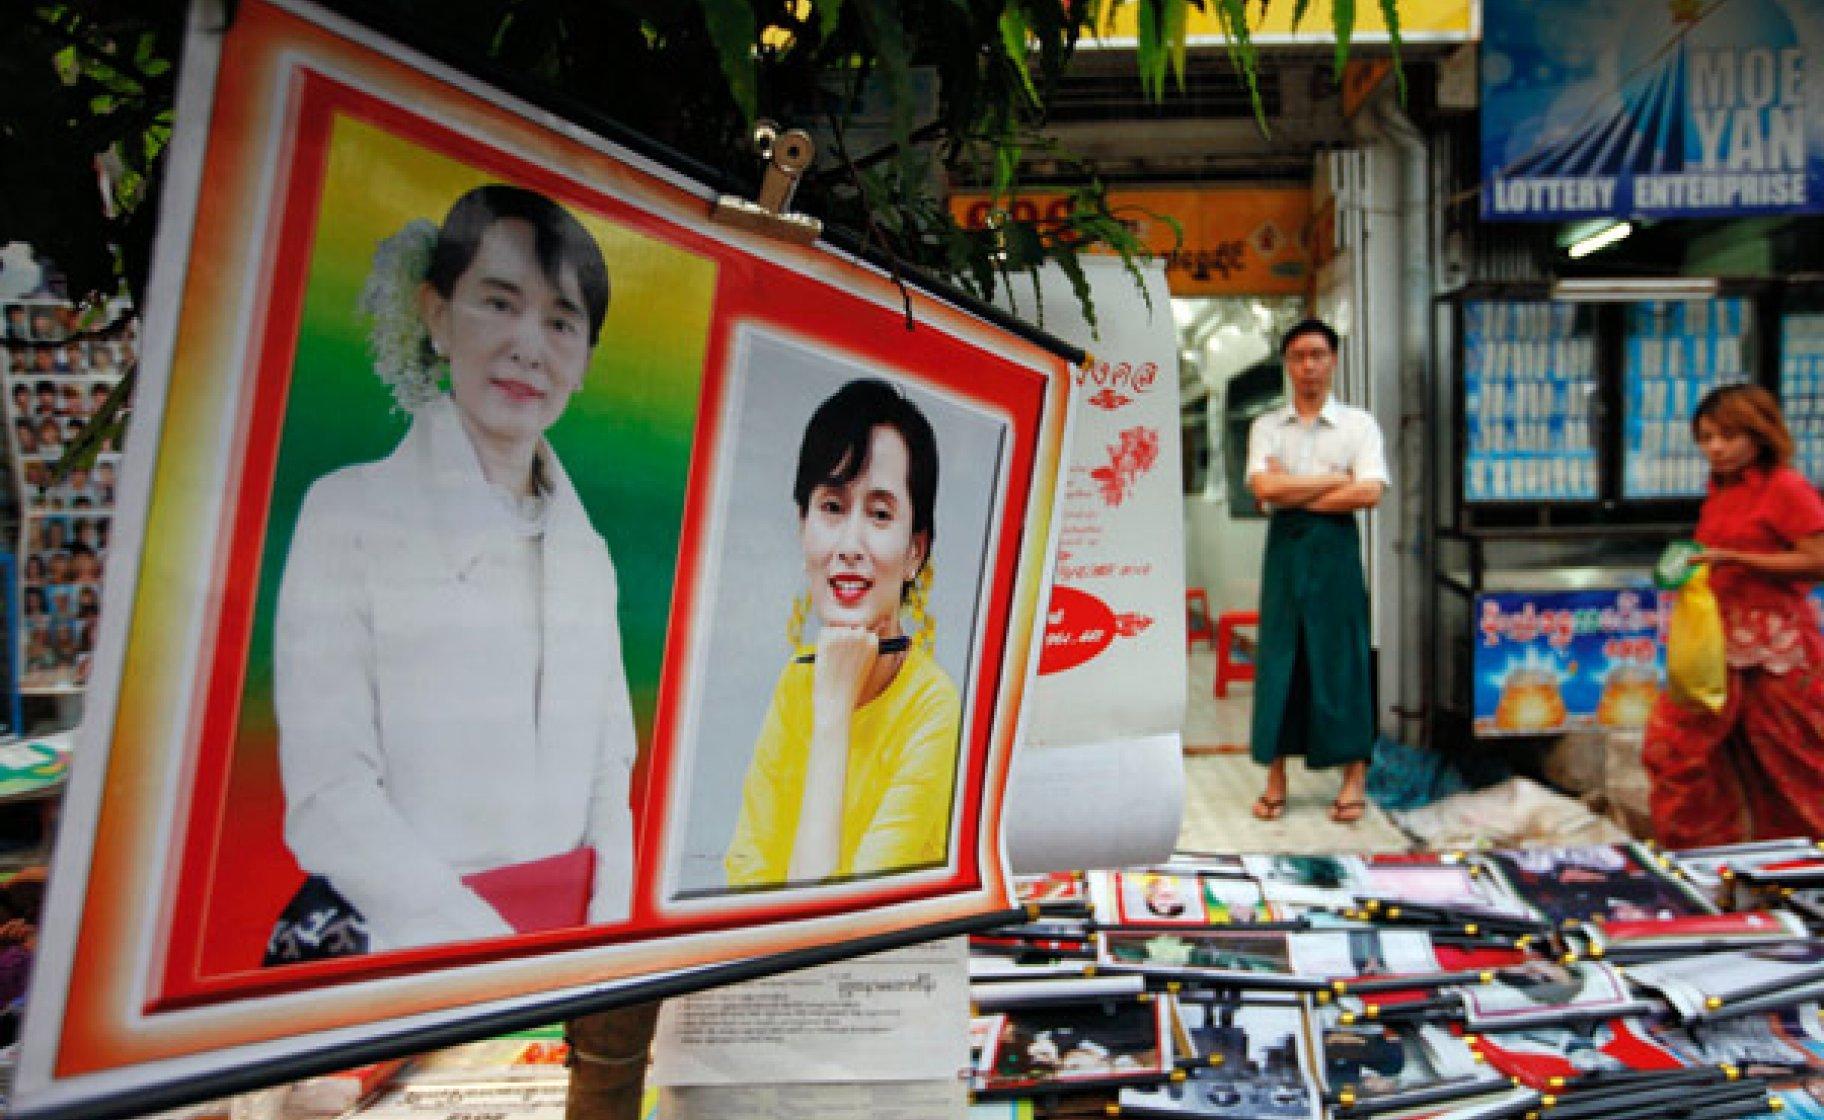 Posters of Burma's pro-democracy leader Aung San Suu Kyi on sale in Rangoon, December 2011 © Soe Zeya Tun/Reuters